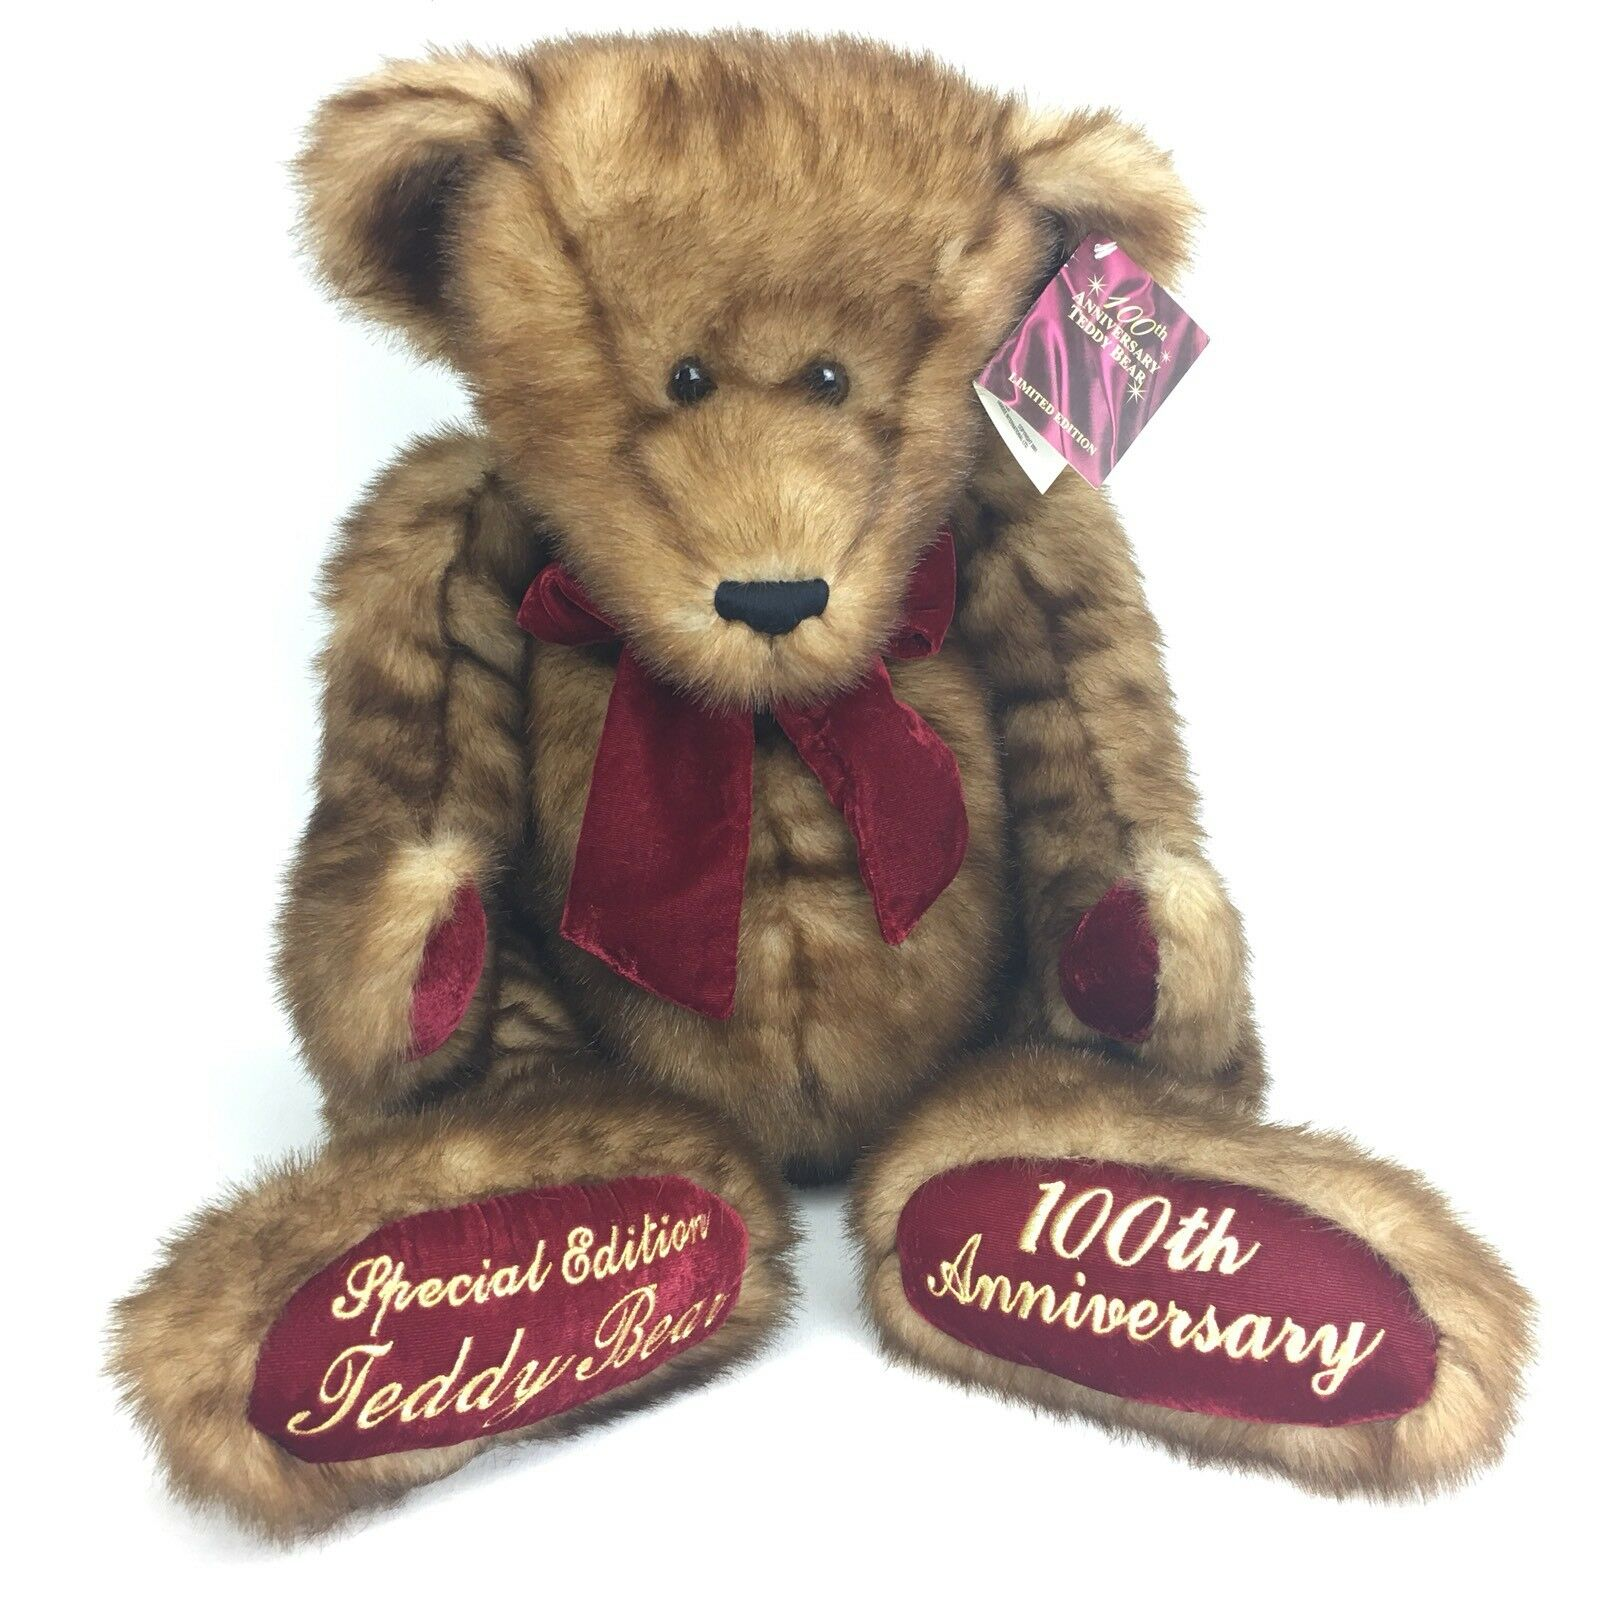 Dan Dee Teddy Bear Braun 100th Anniversary Limited Edition 2001 Large